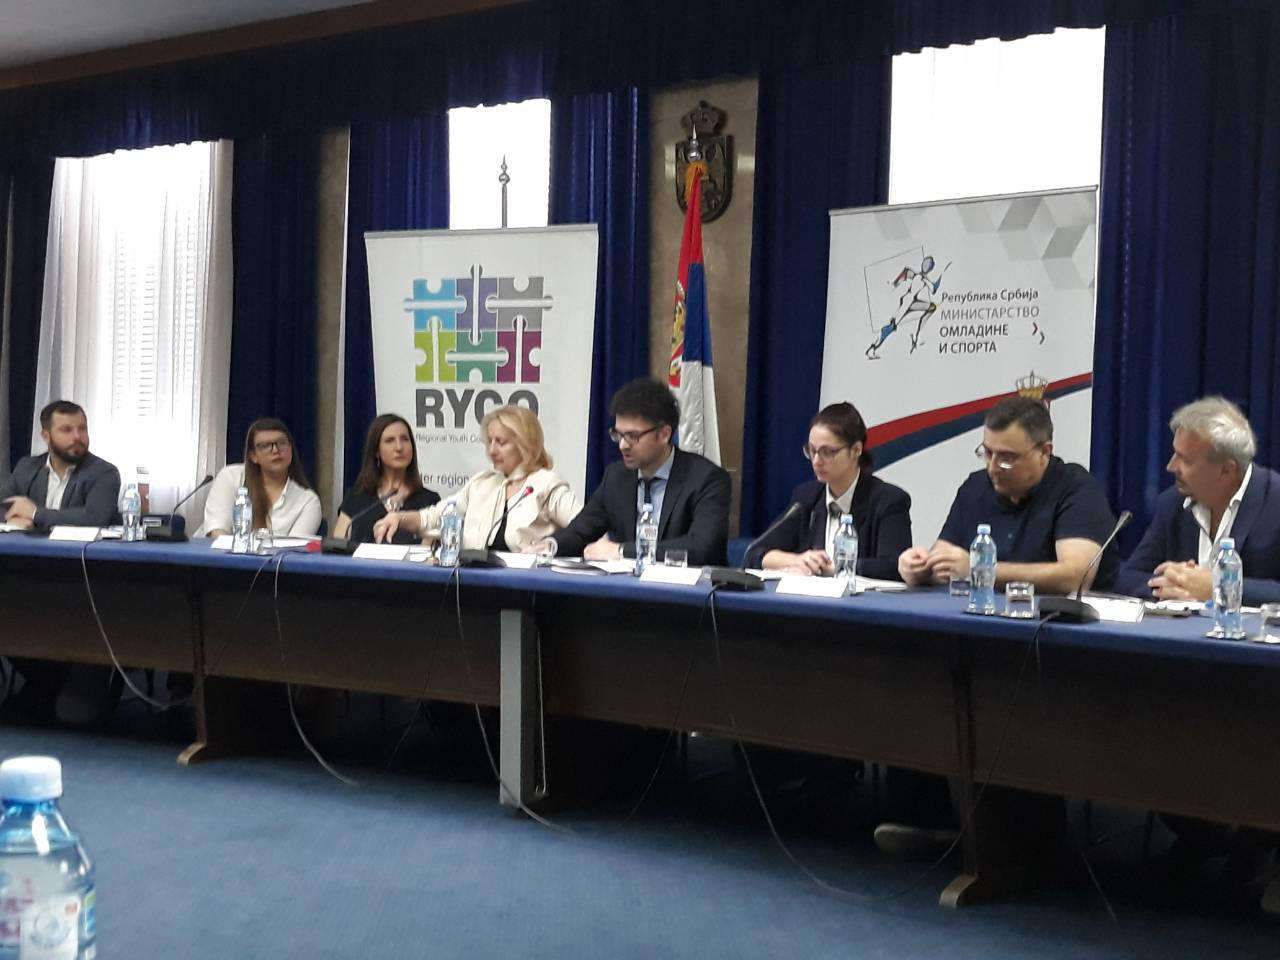 Svečana dodela ugovora za projekte odobrene od strane Regionalne kancelarije za saradnju mladih